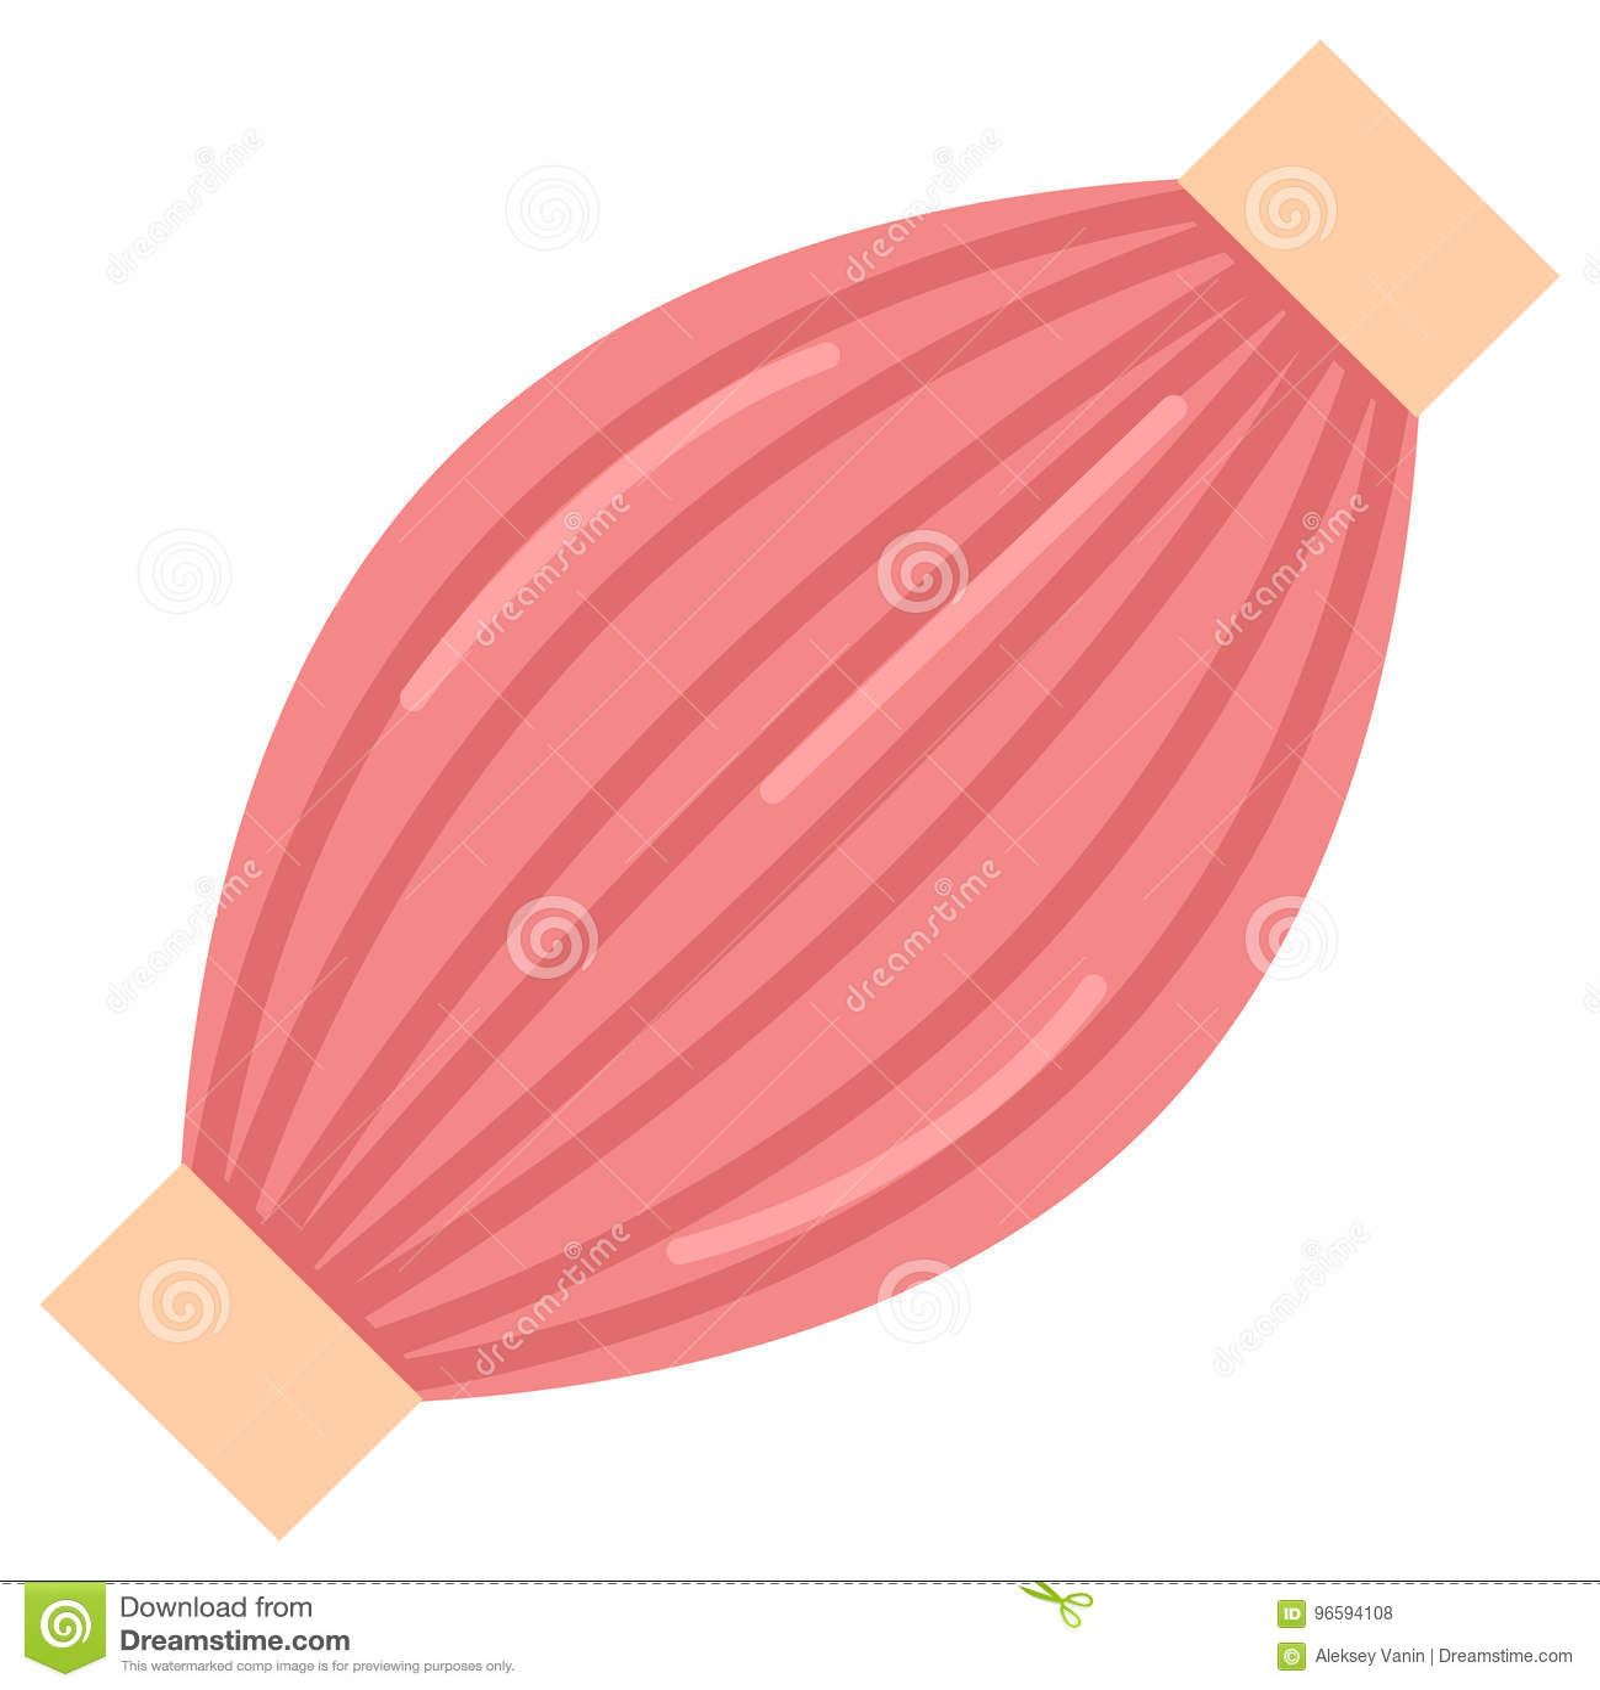 Human Muscle Icon Vector Illustration Stock Vector Illustration